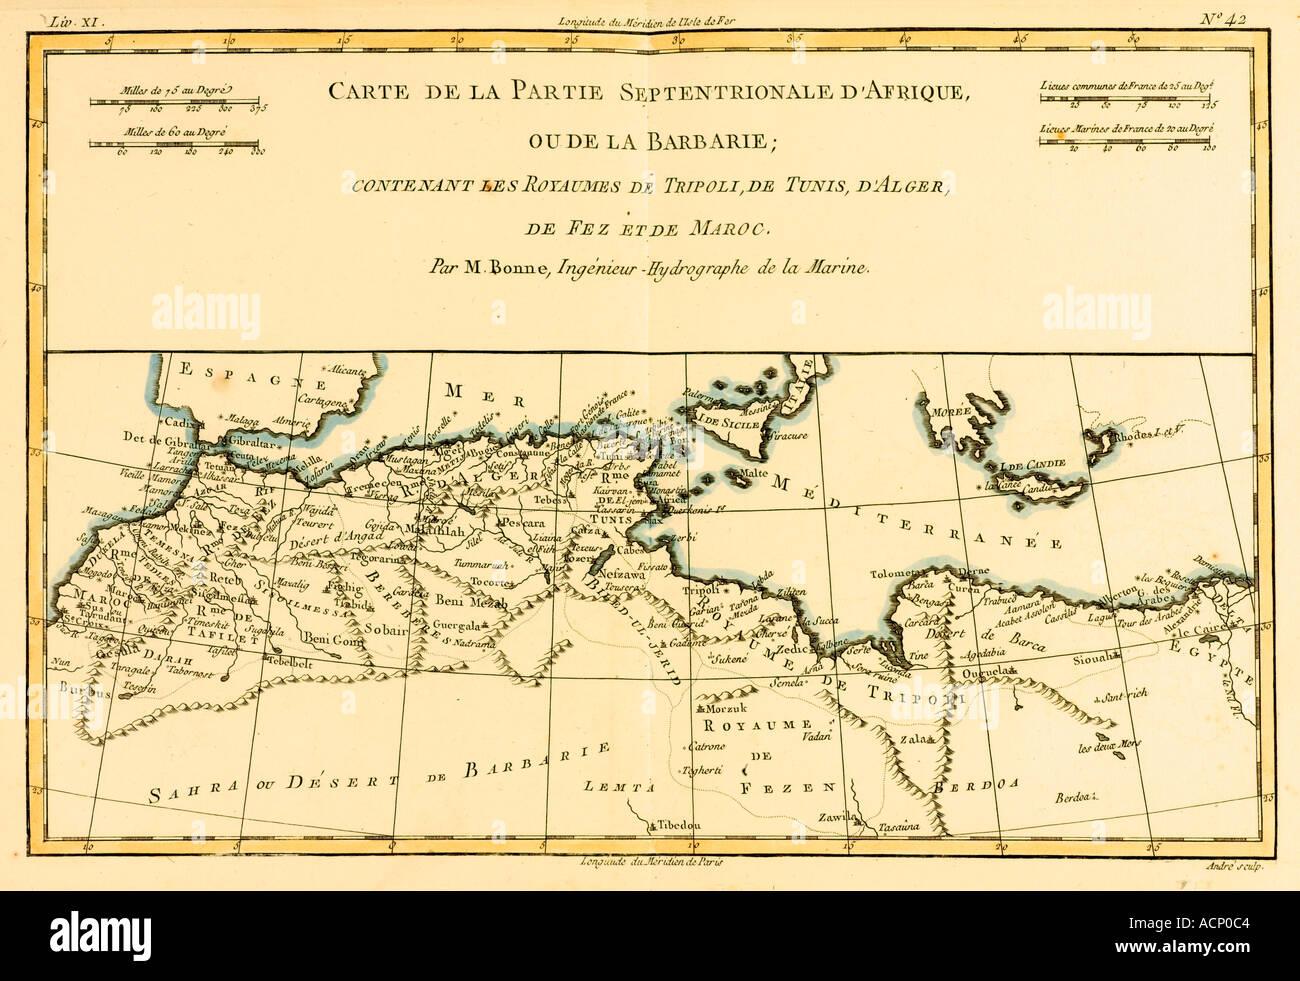 North Africa Map Stockfotos & North Africa Map Bilder - Alamy